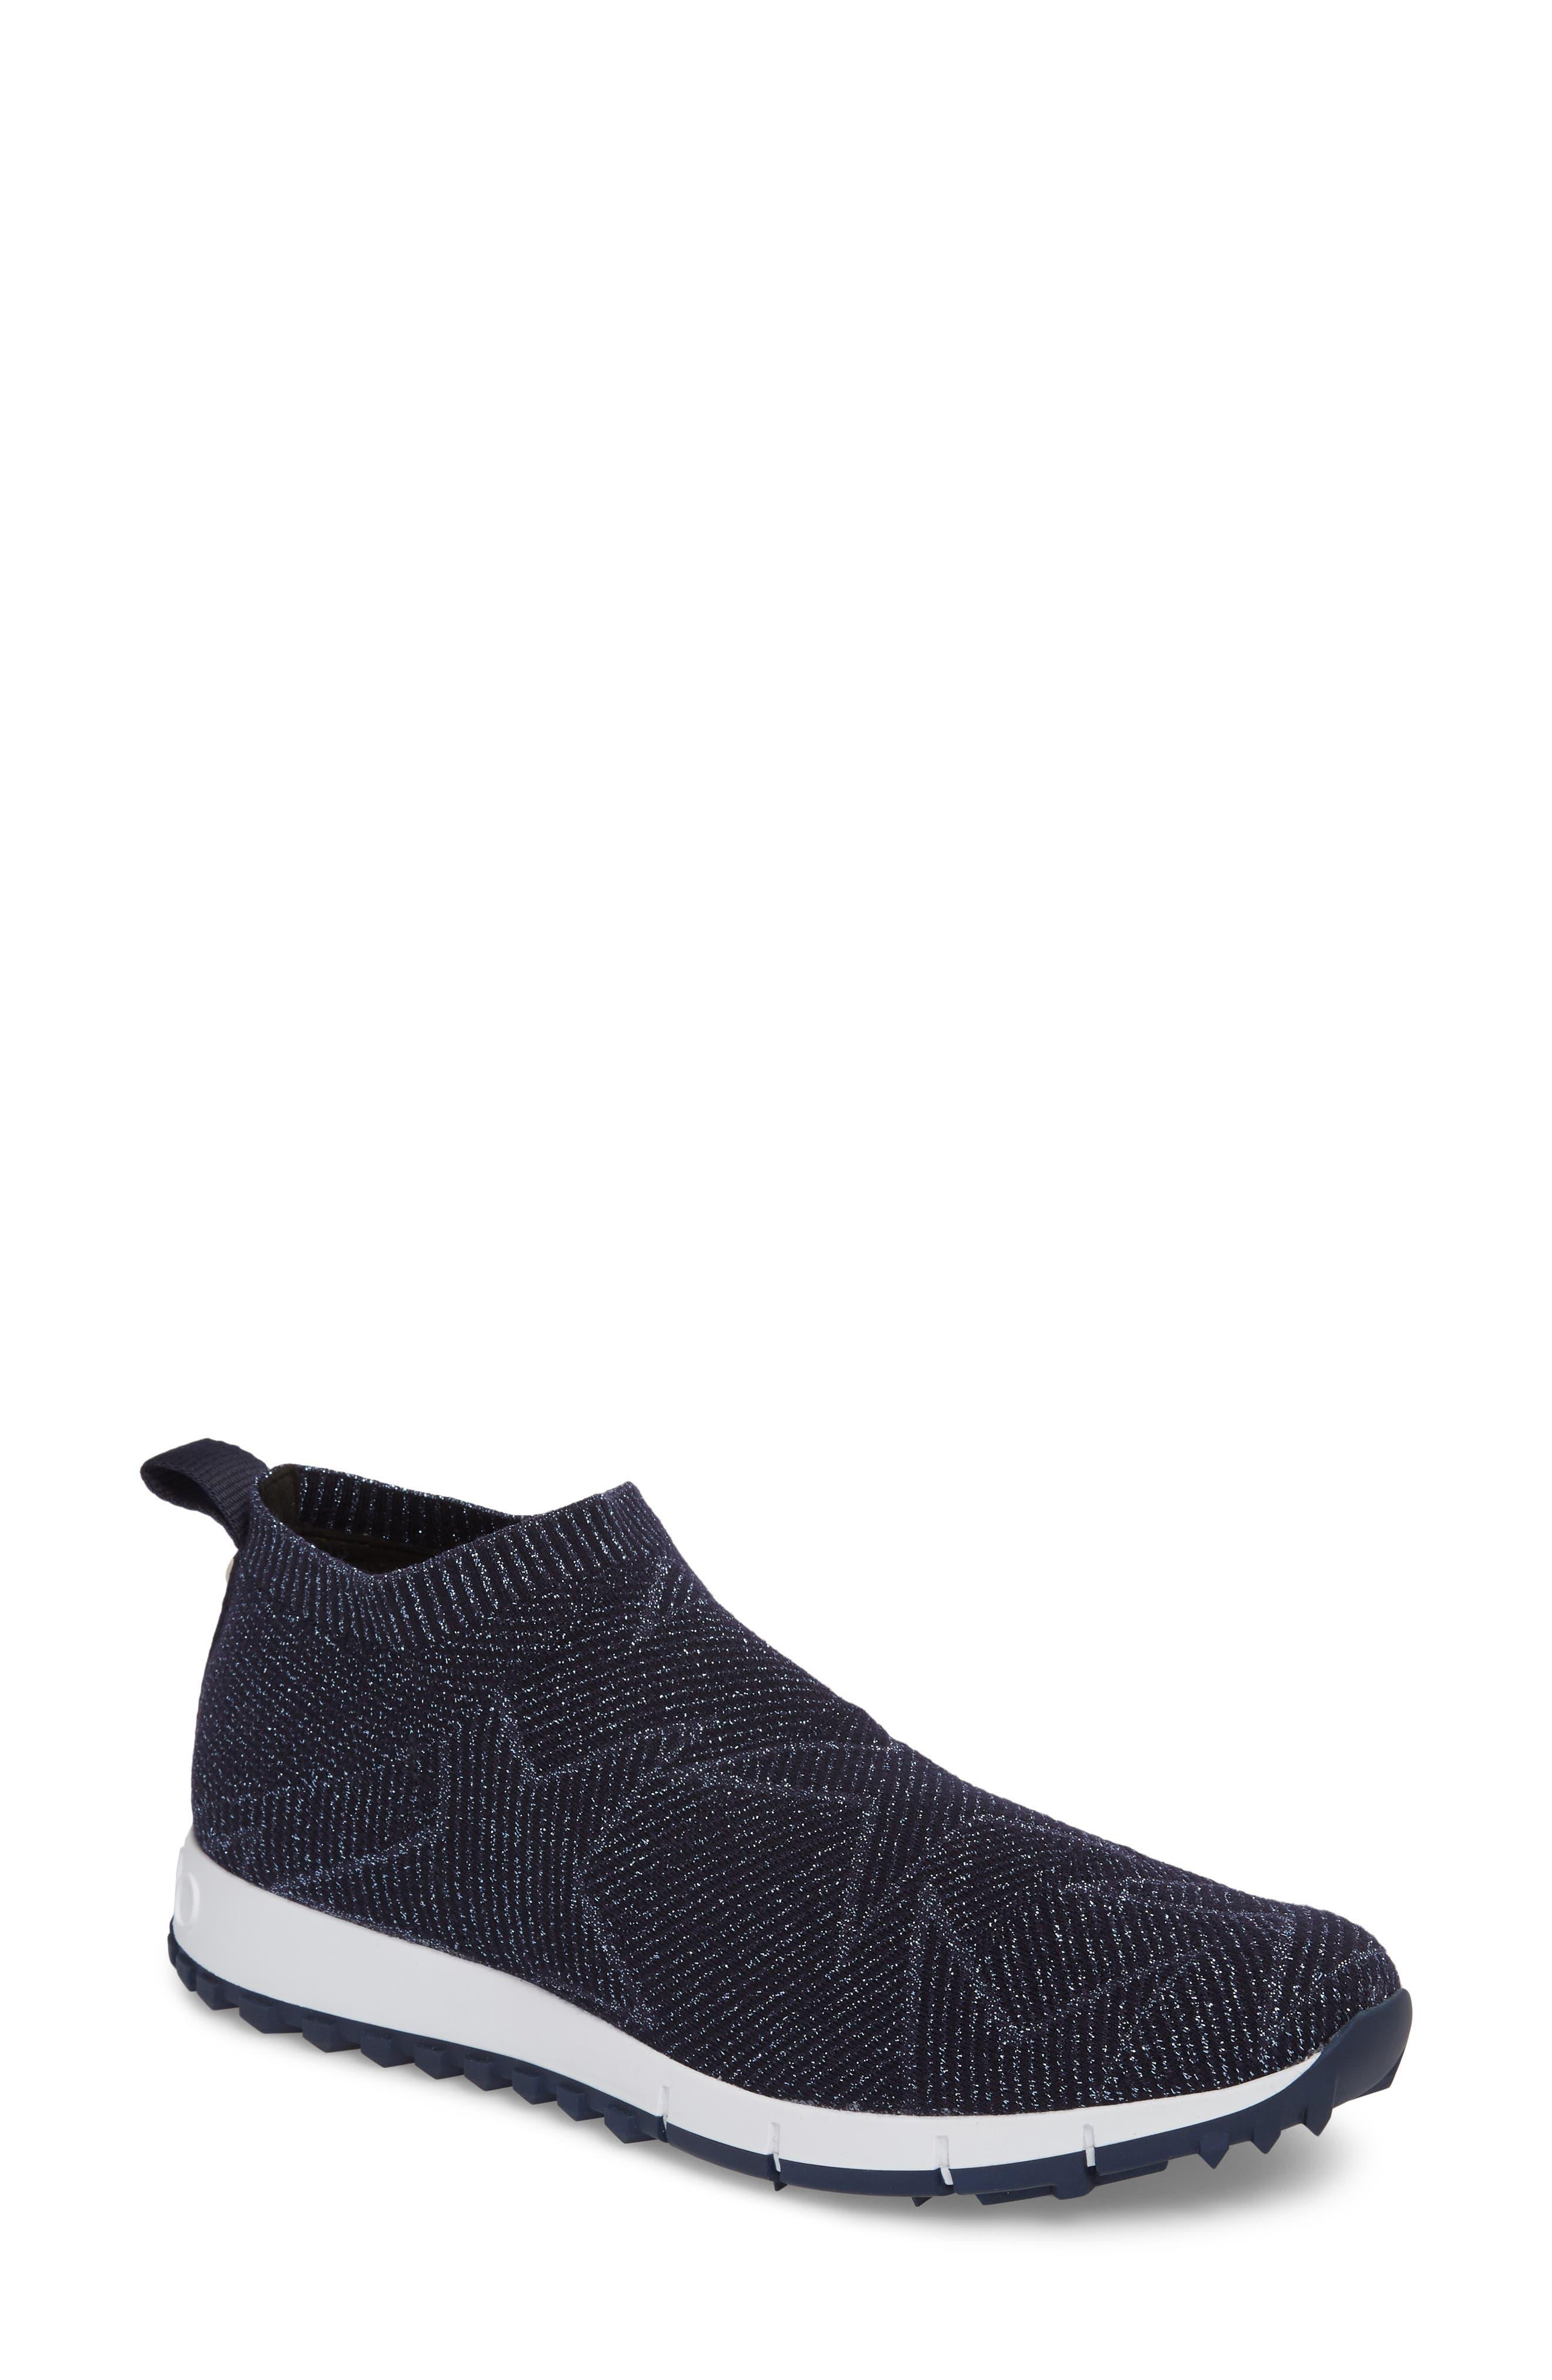 Norway Star Slip-On Sneaker,                         Main,                         color, Navy